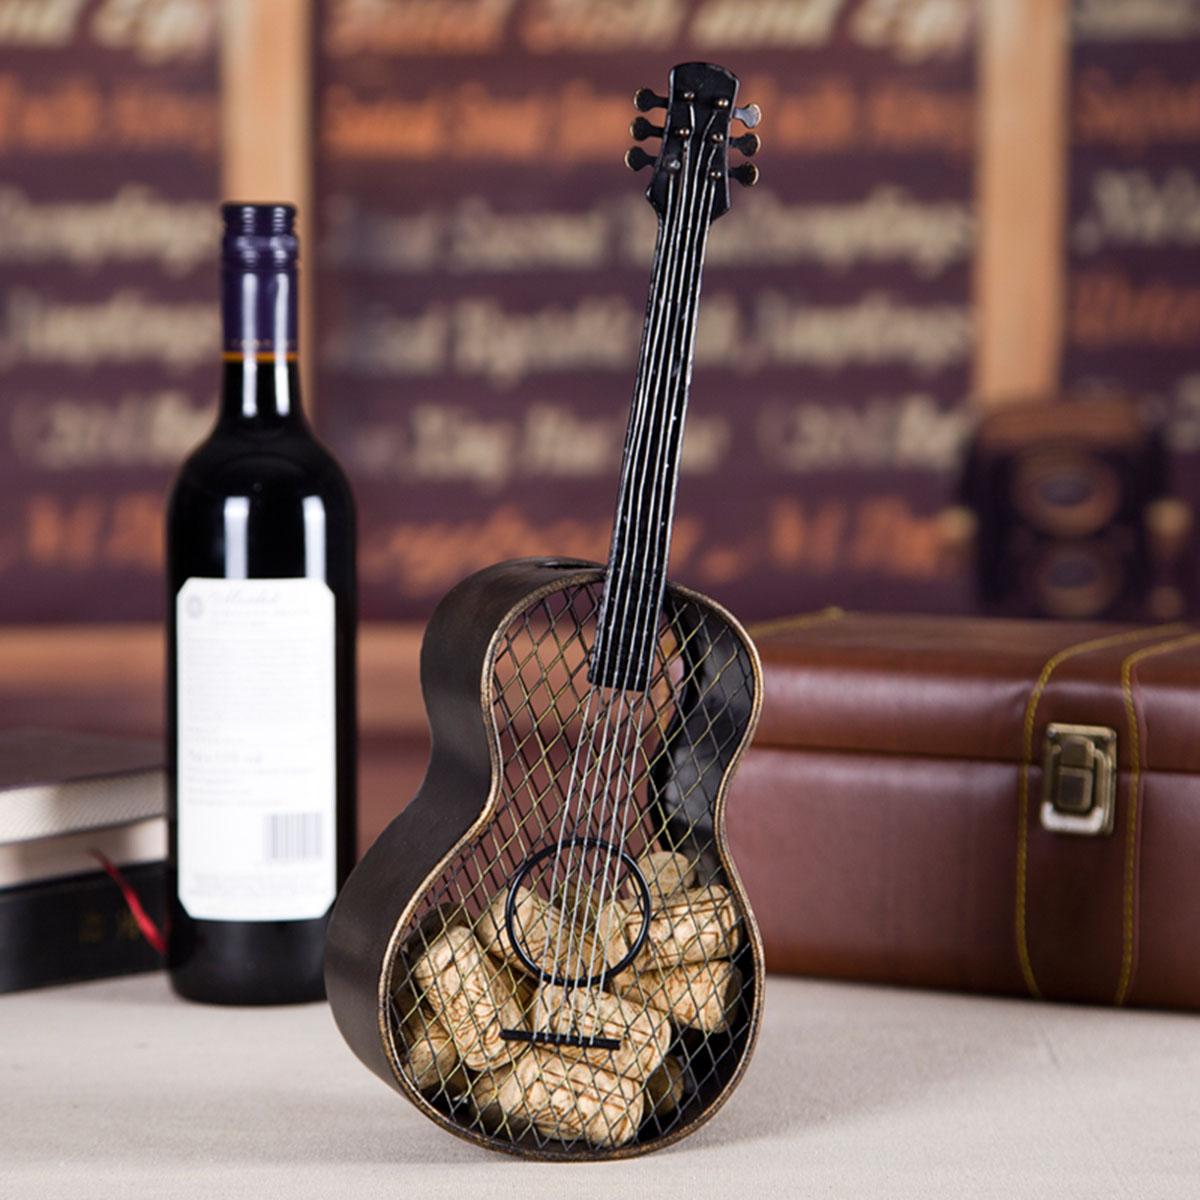 bd company a_034 Guitar Wine Cork Container Practical Sculp Home Decor. ( Item#: A034 )